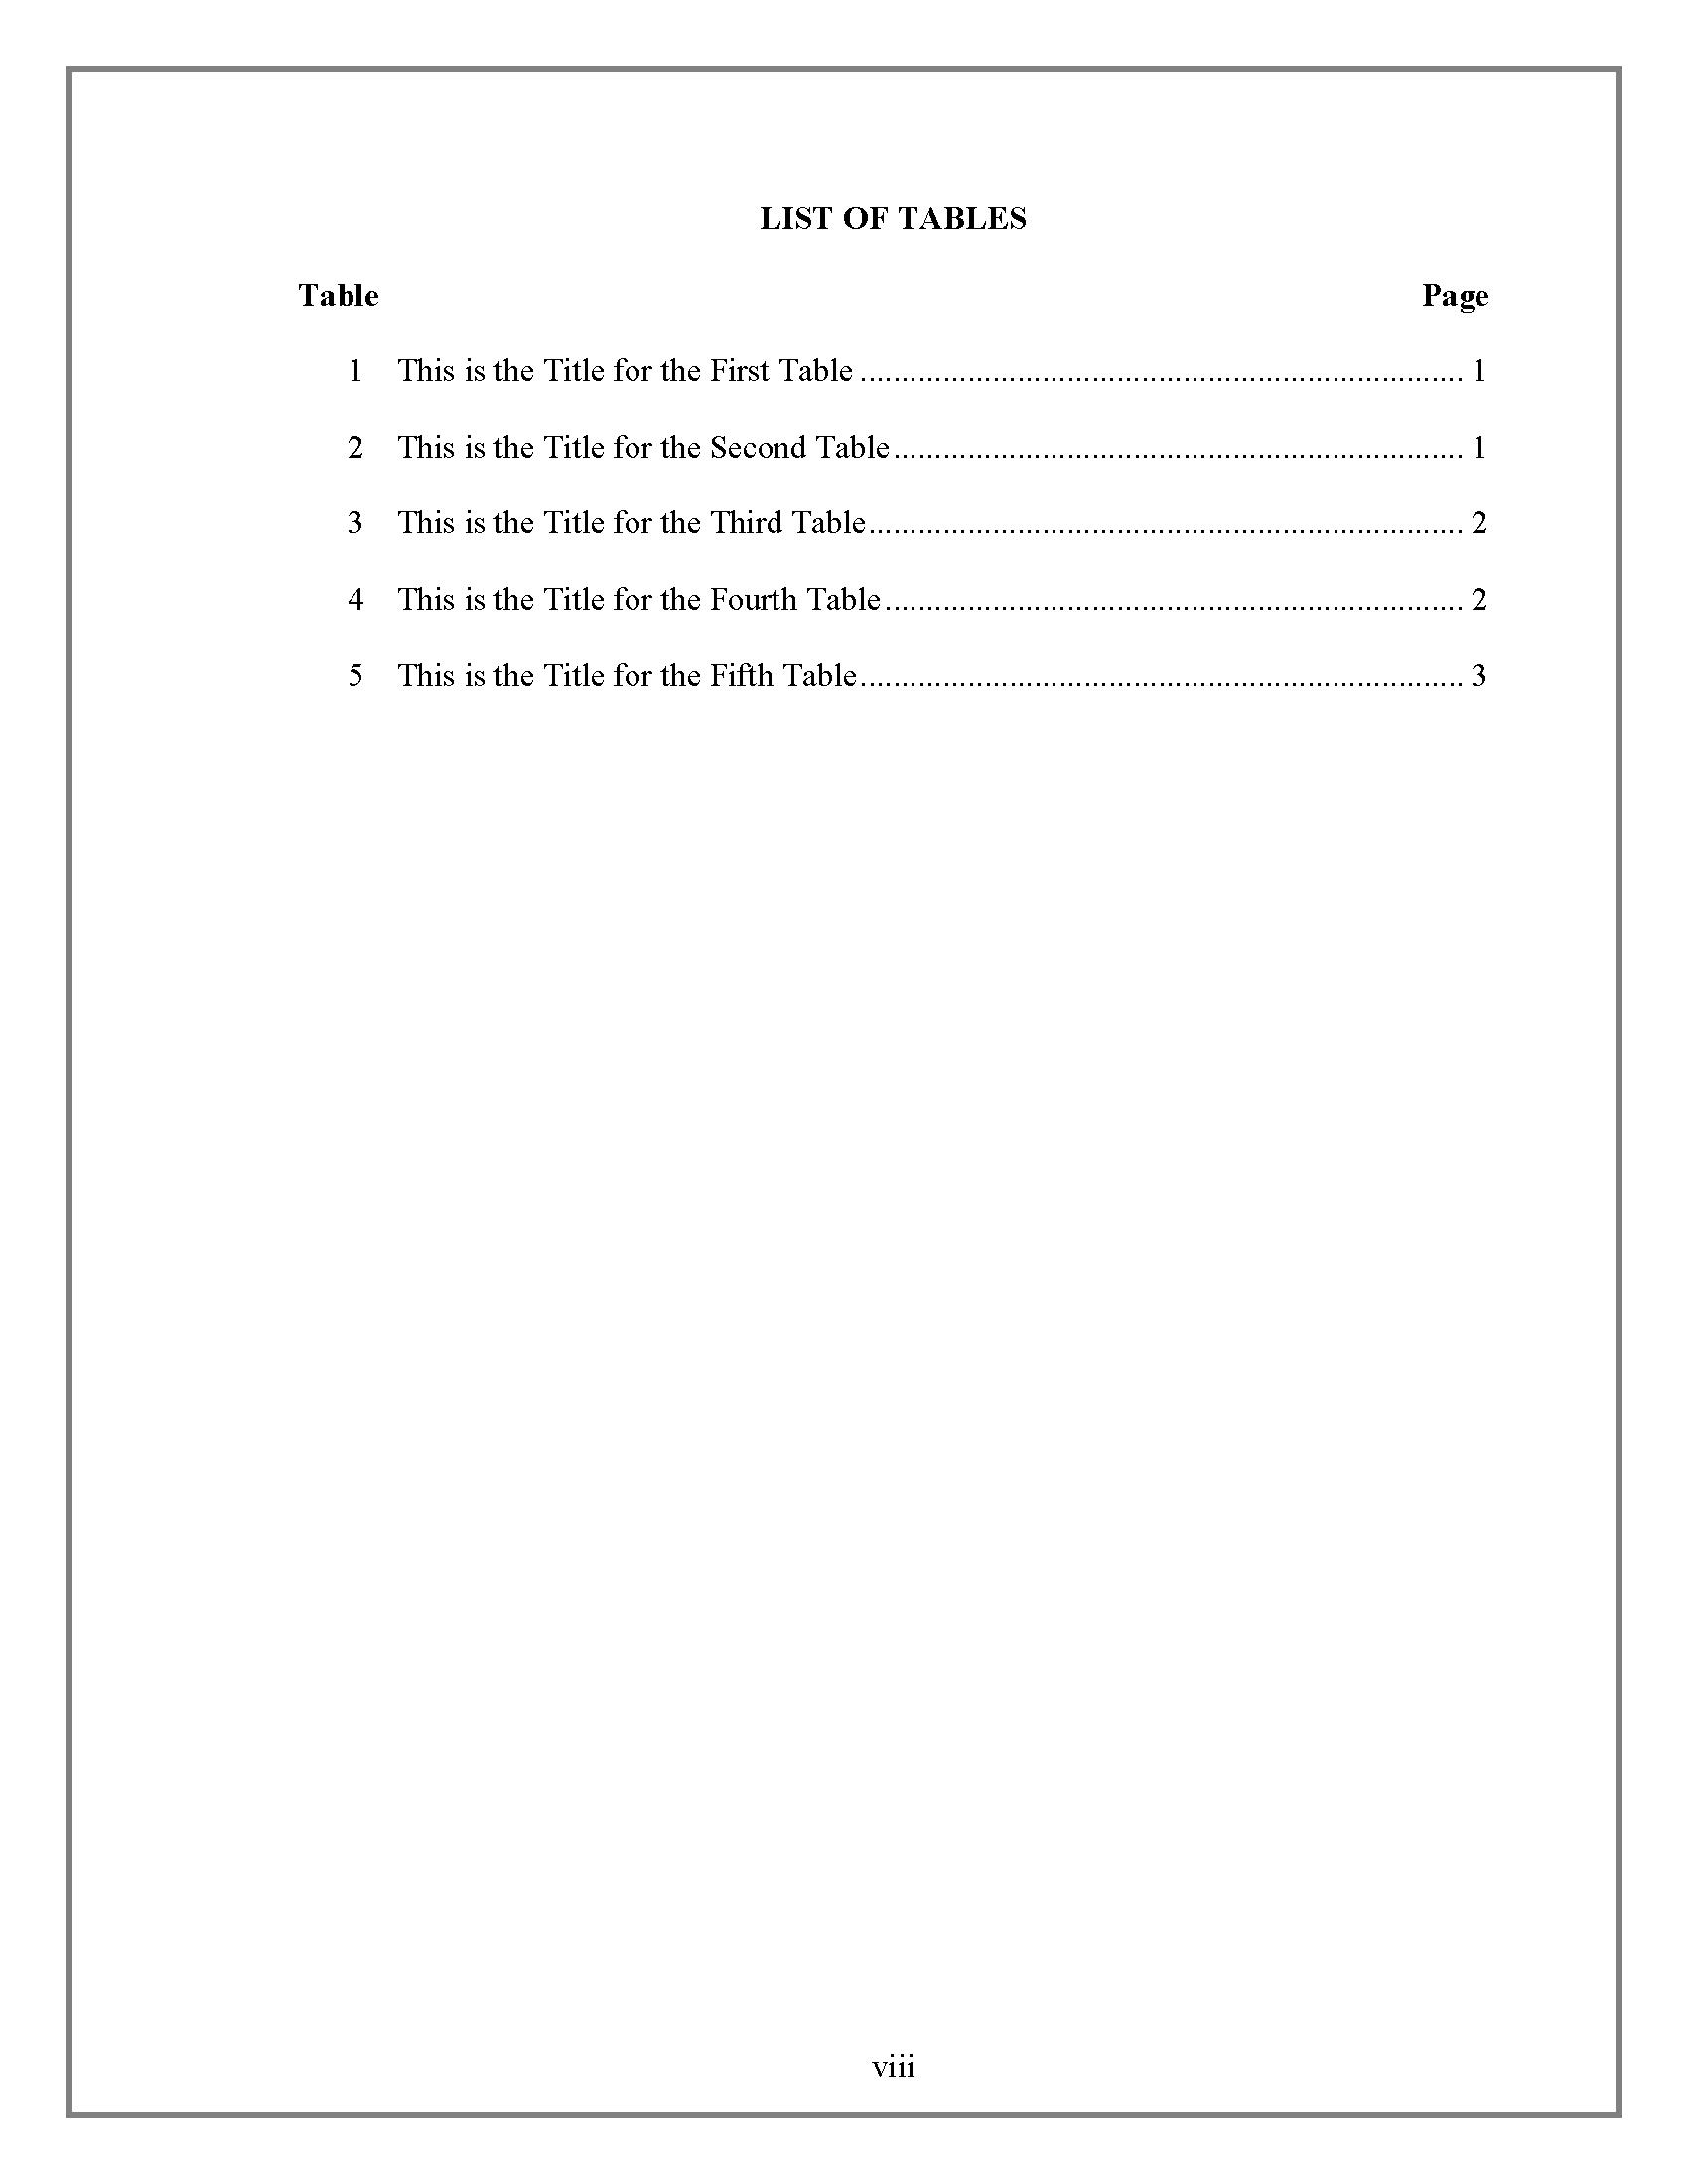 Macro-Template Instructions